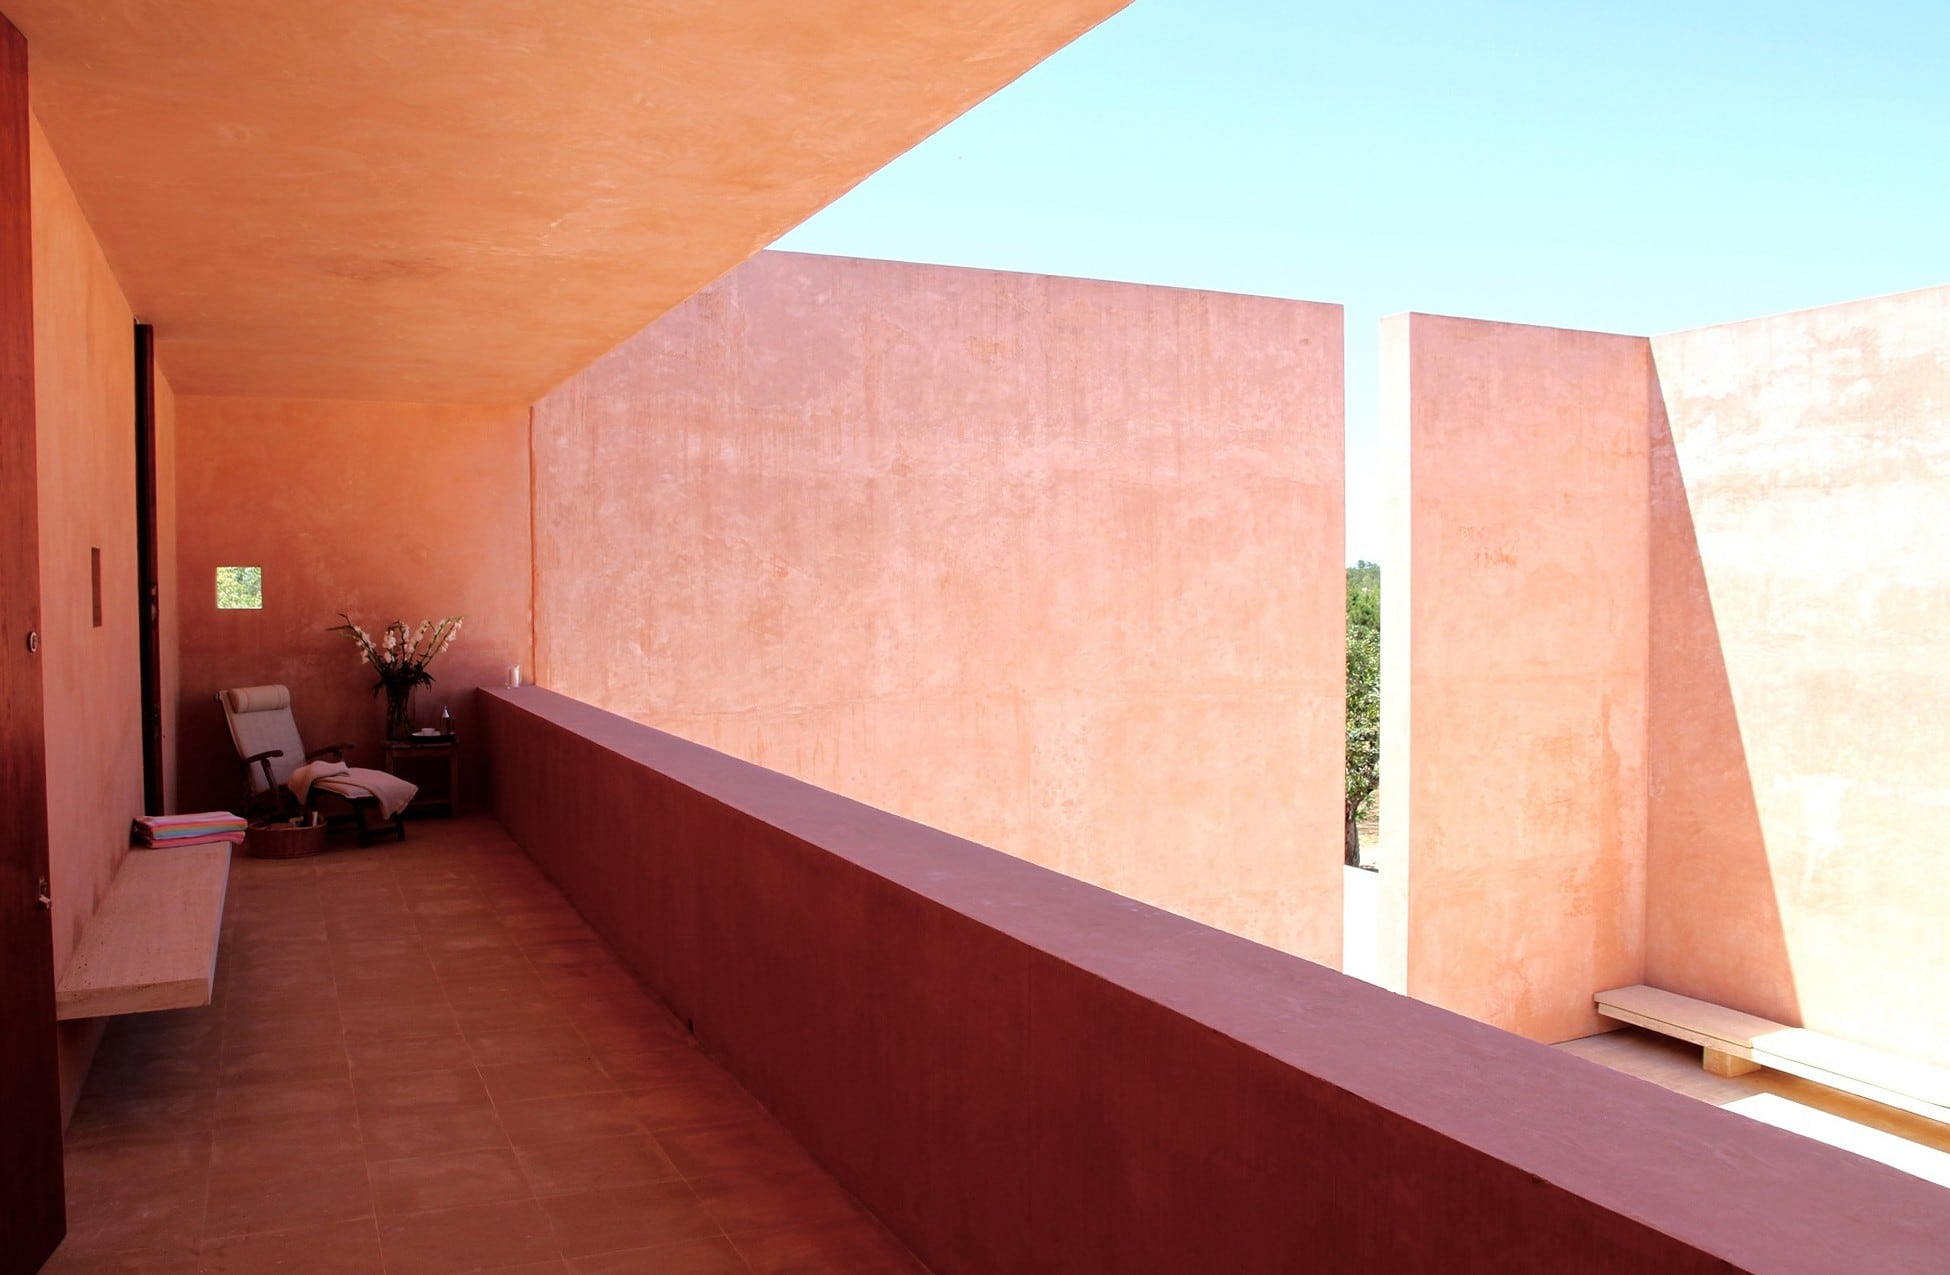 Pawson_Mallorca_03kopie.jpg